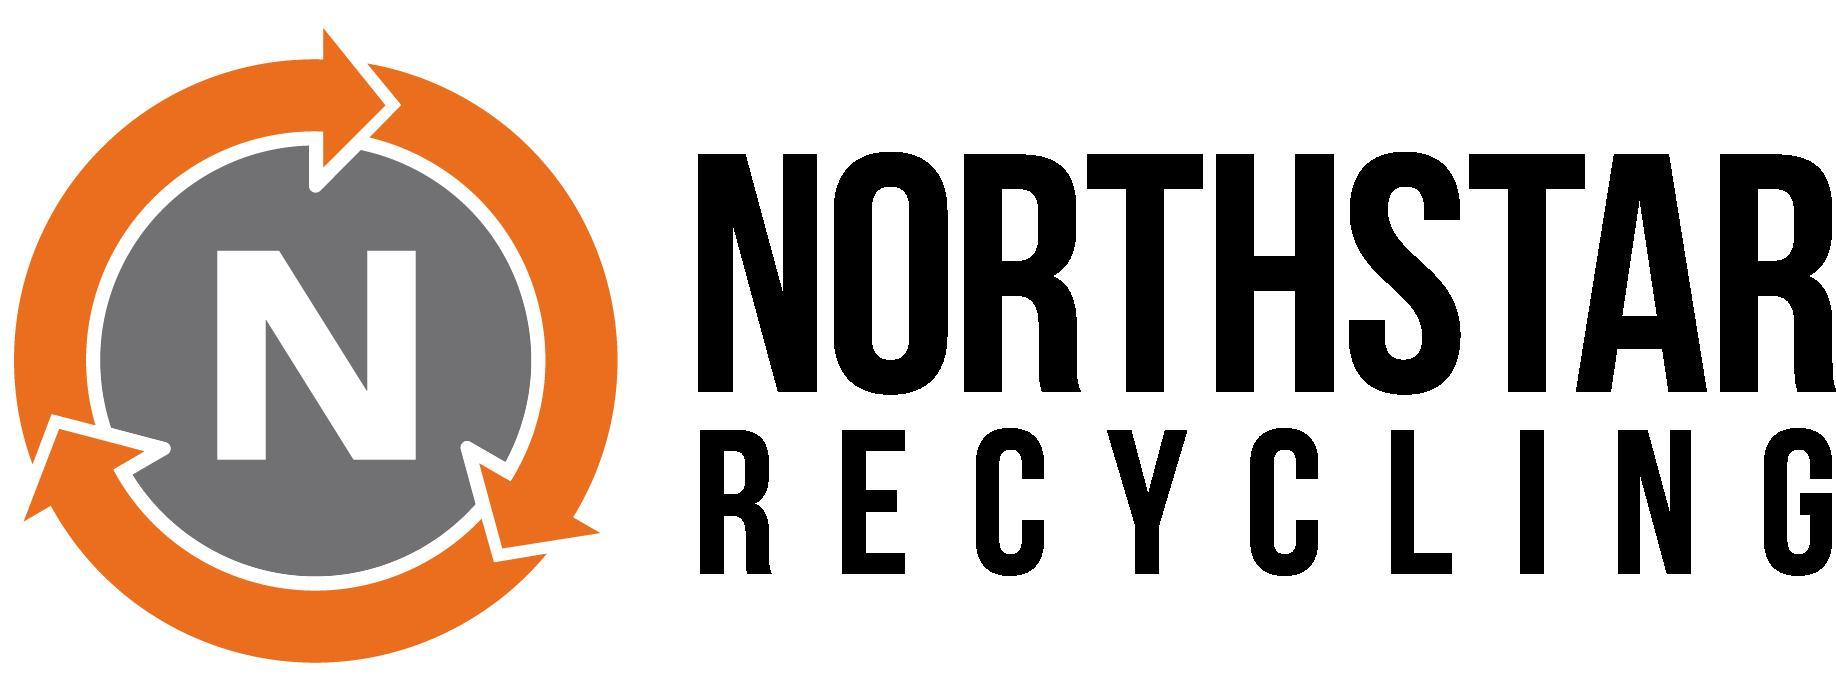 Northstar Recycling Logo